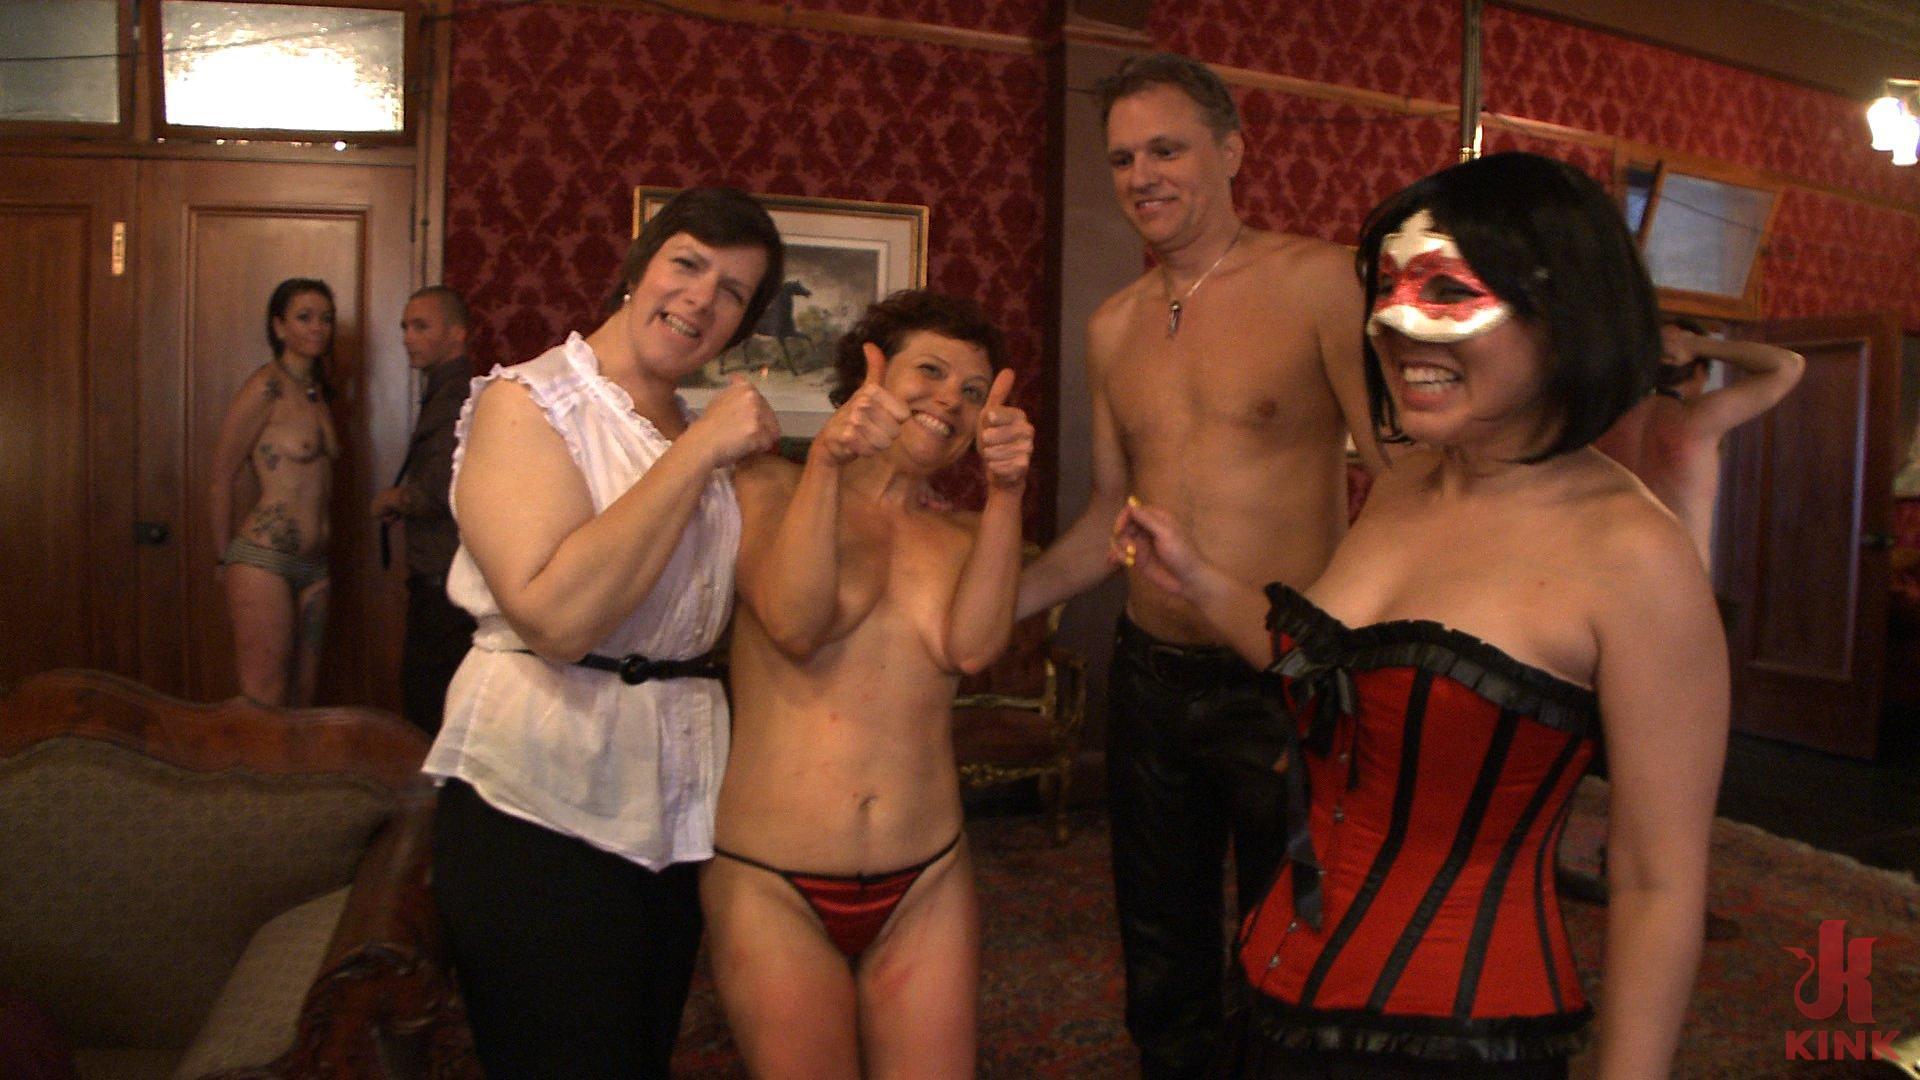 Photo number 8 from Stefanos' Brunch shot for The Upper Floor on Kink.com. Featuring Maestro Stefanos, Nerine Mechanique and Lilla Katt in hardcore BDSM & Fetish porn.